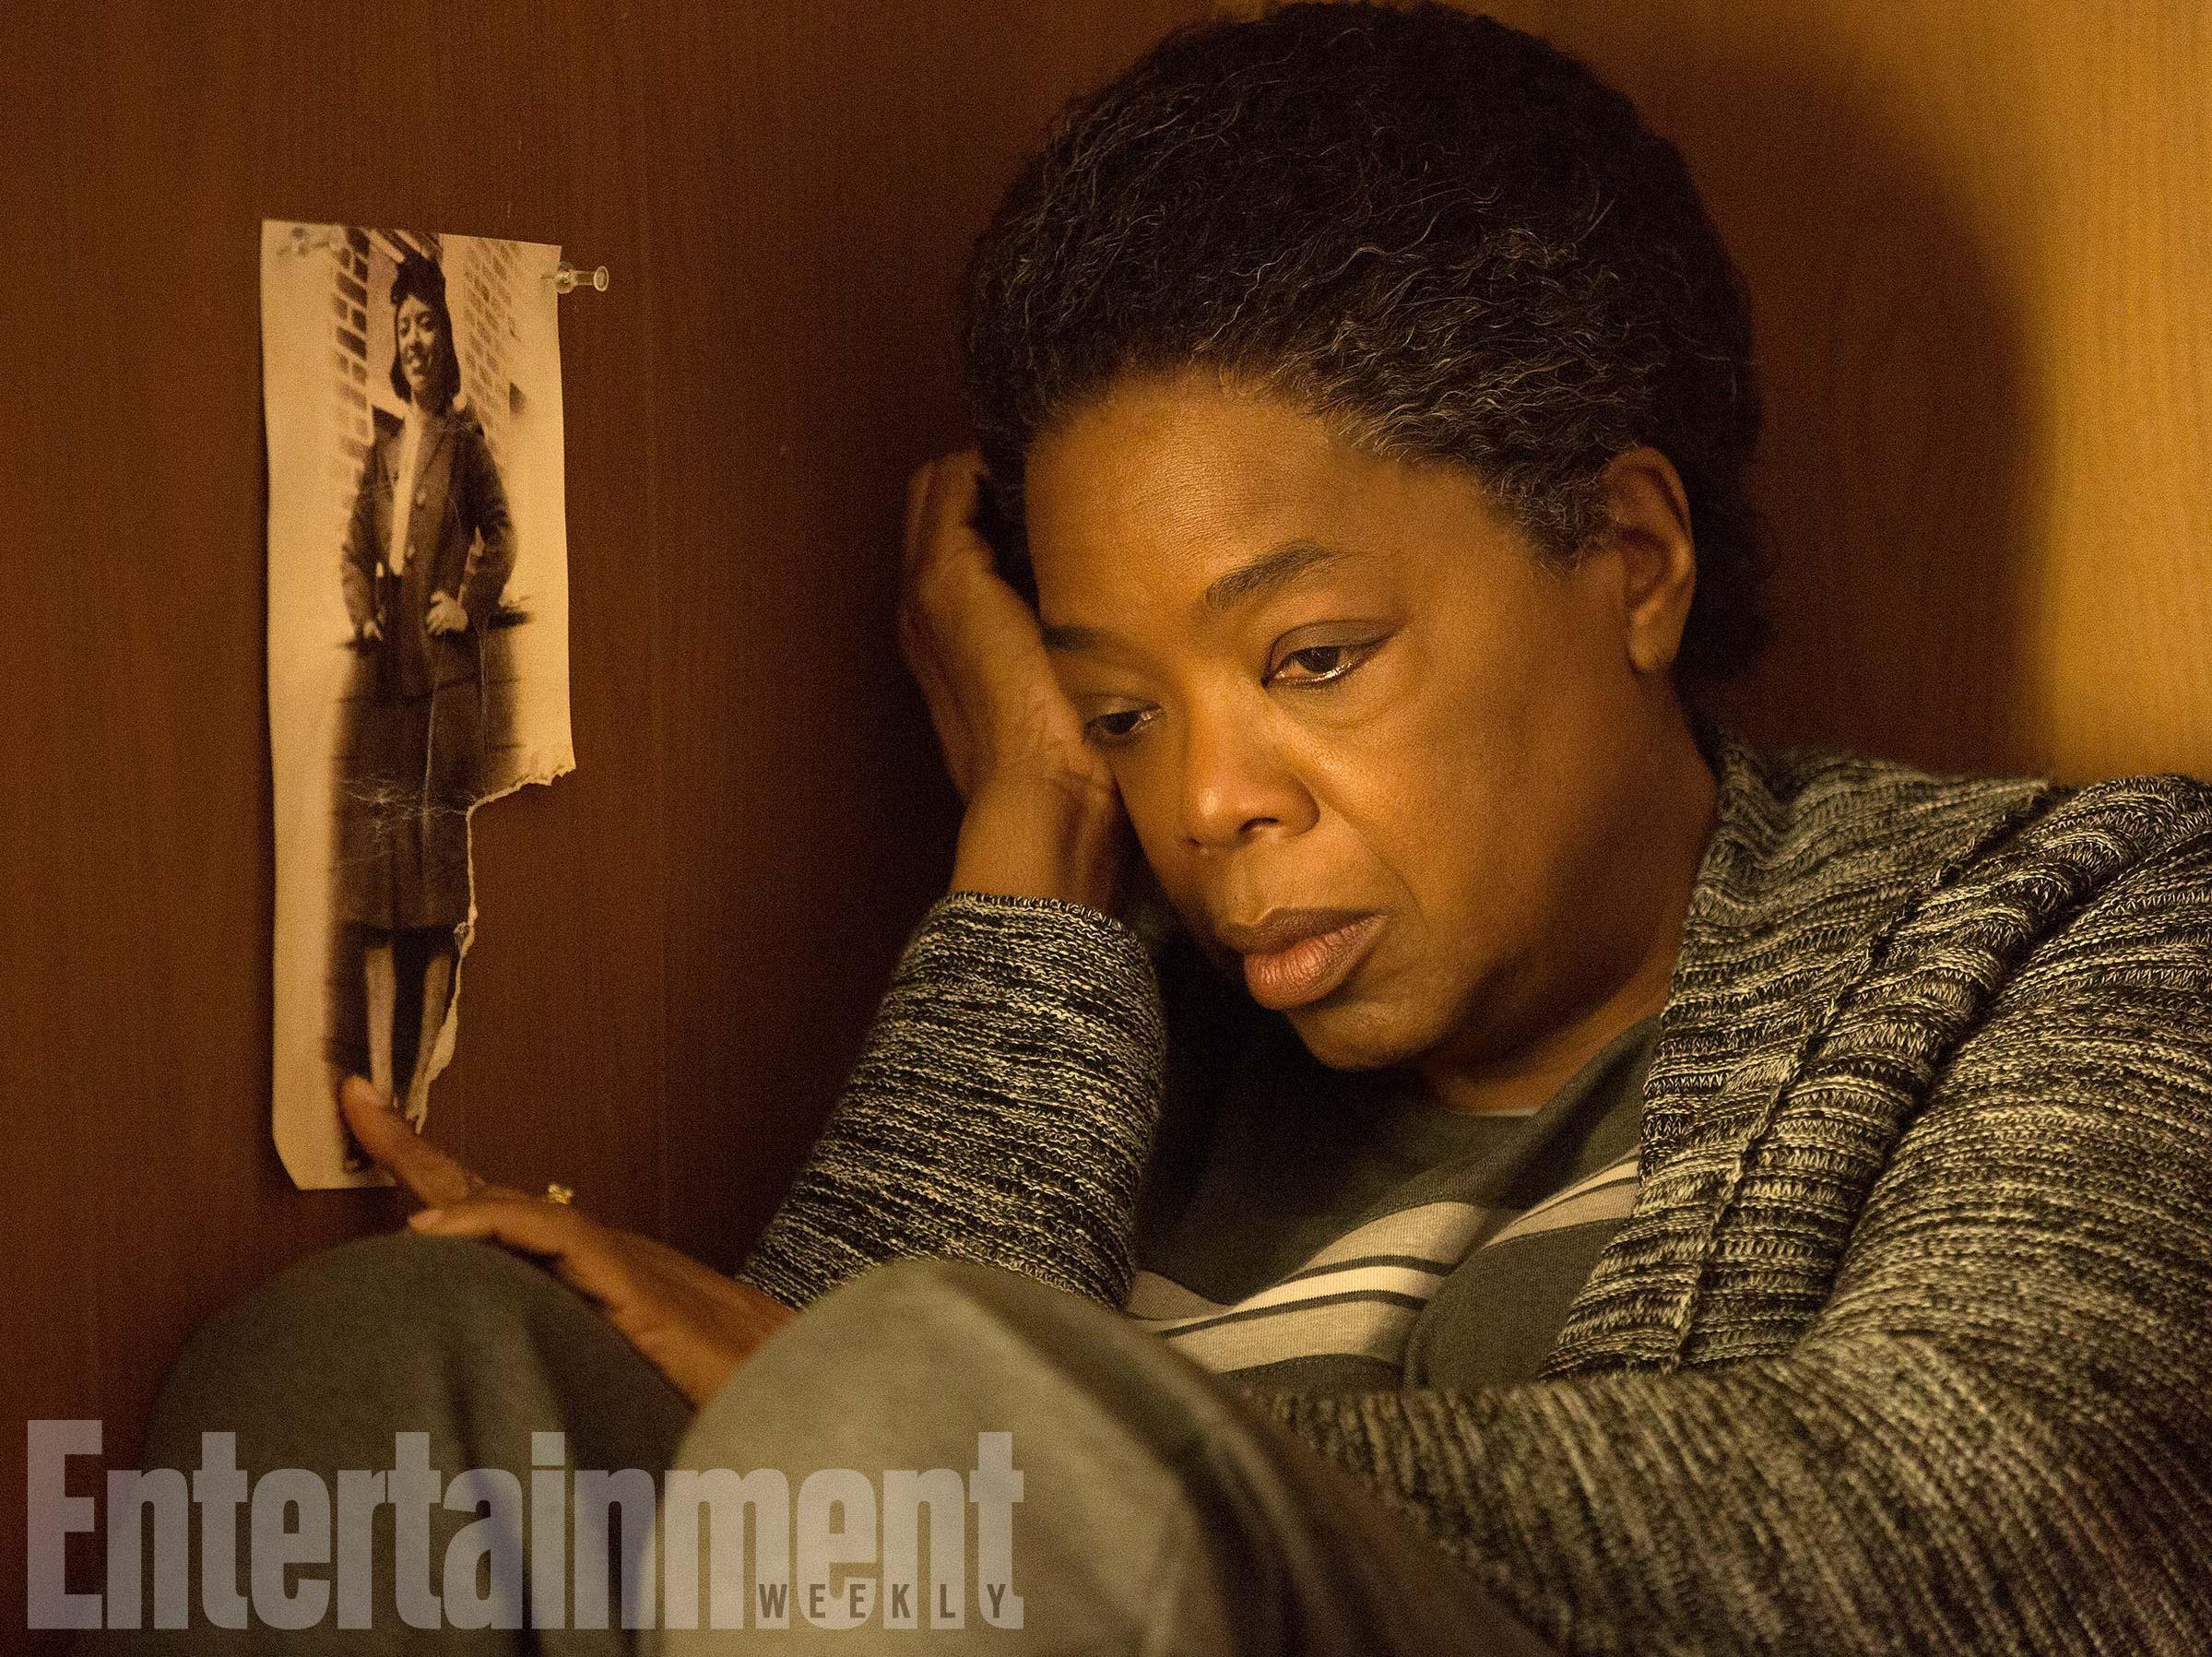 Oprah Winfrey In The Immortal Life Of Henrietta Lacks See The Photos Http Ift Tt 2hxfw9u Oprah Oprah Winfrey Henrietta Lacks